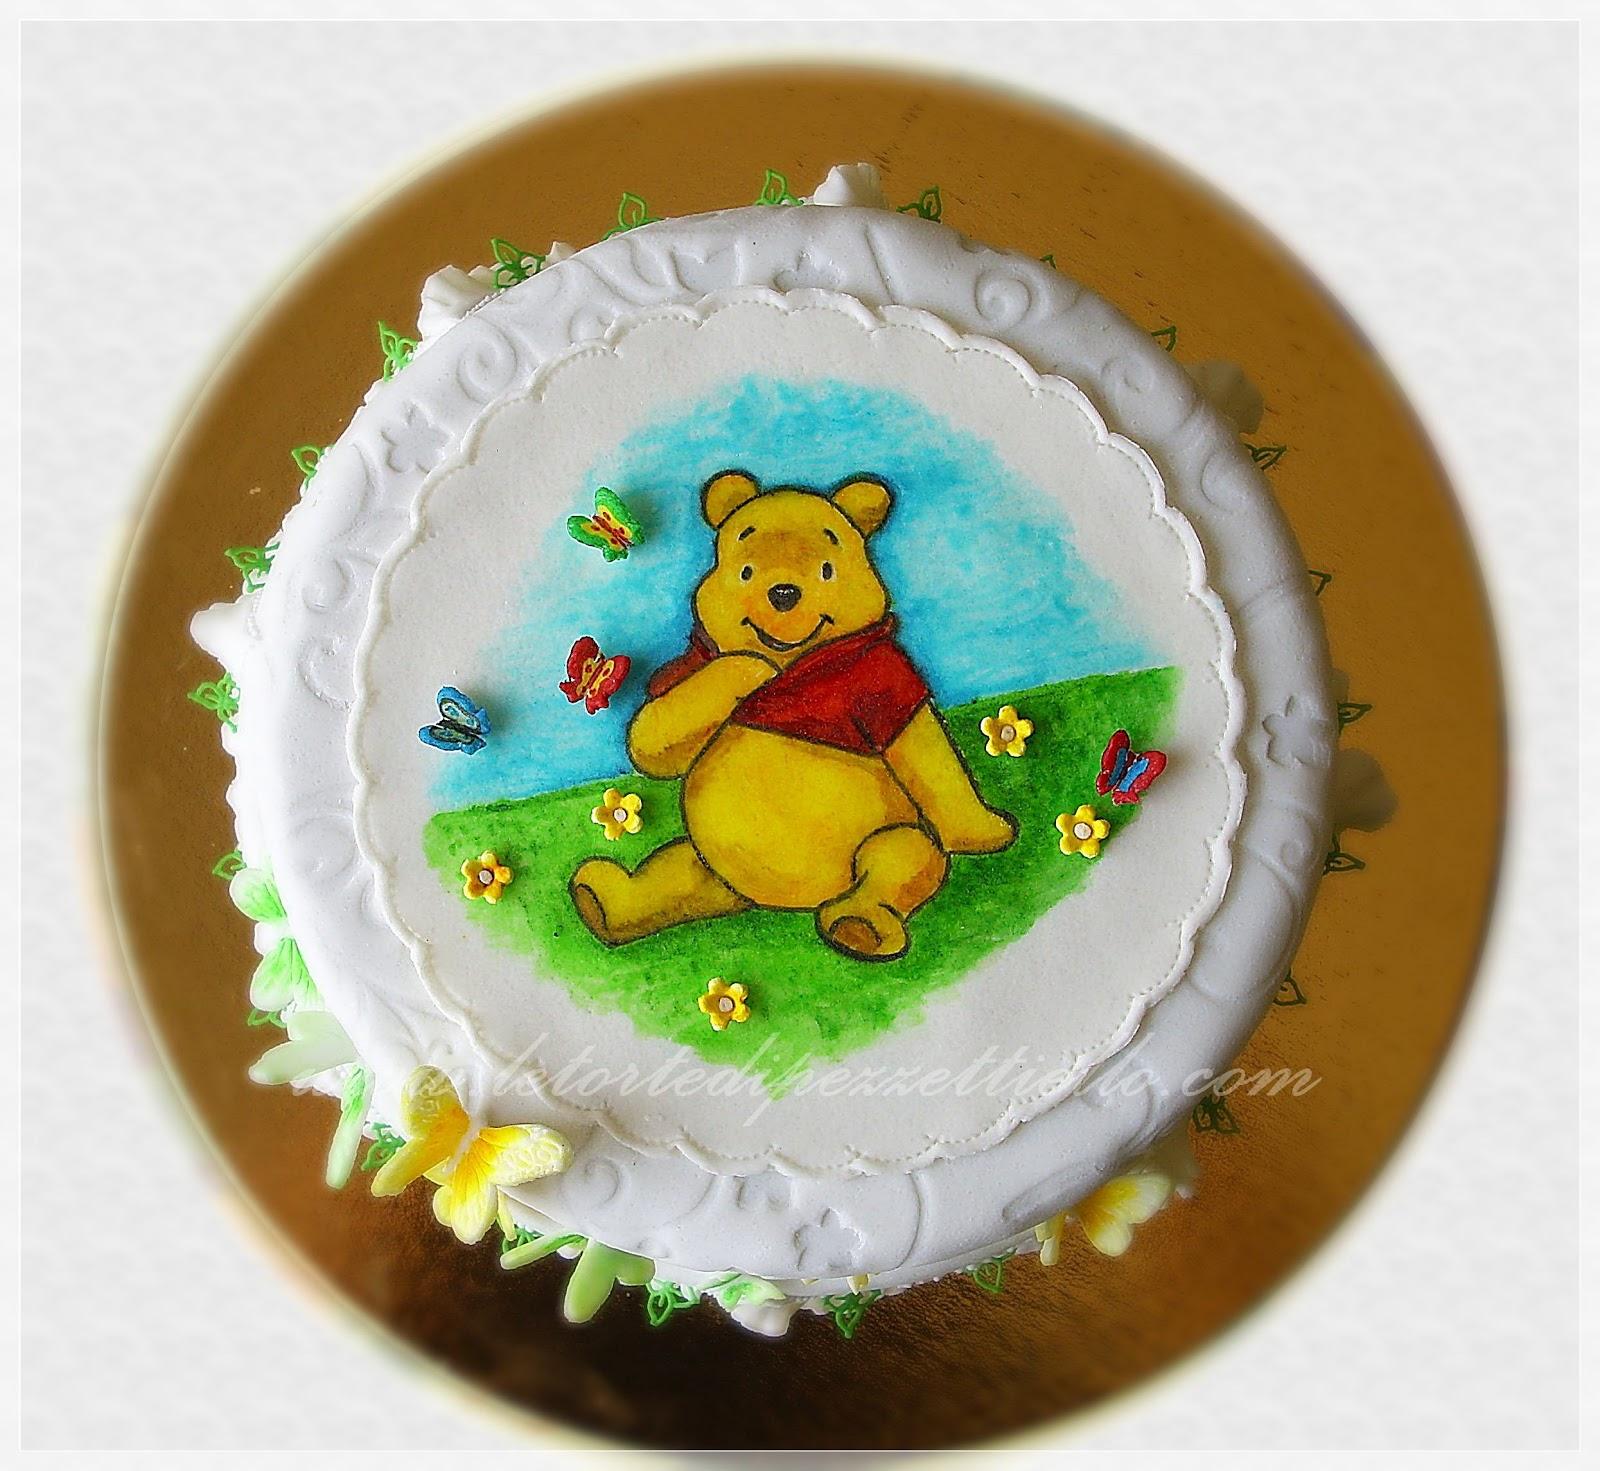 Pdz sap torta a due piani winnie the pooh le torte di for Piani a due piani in florida